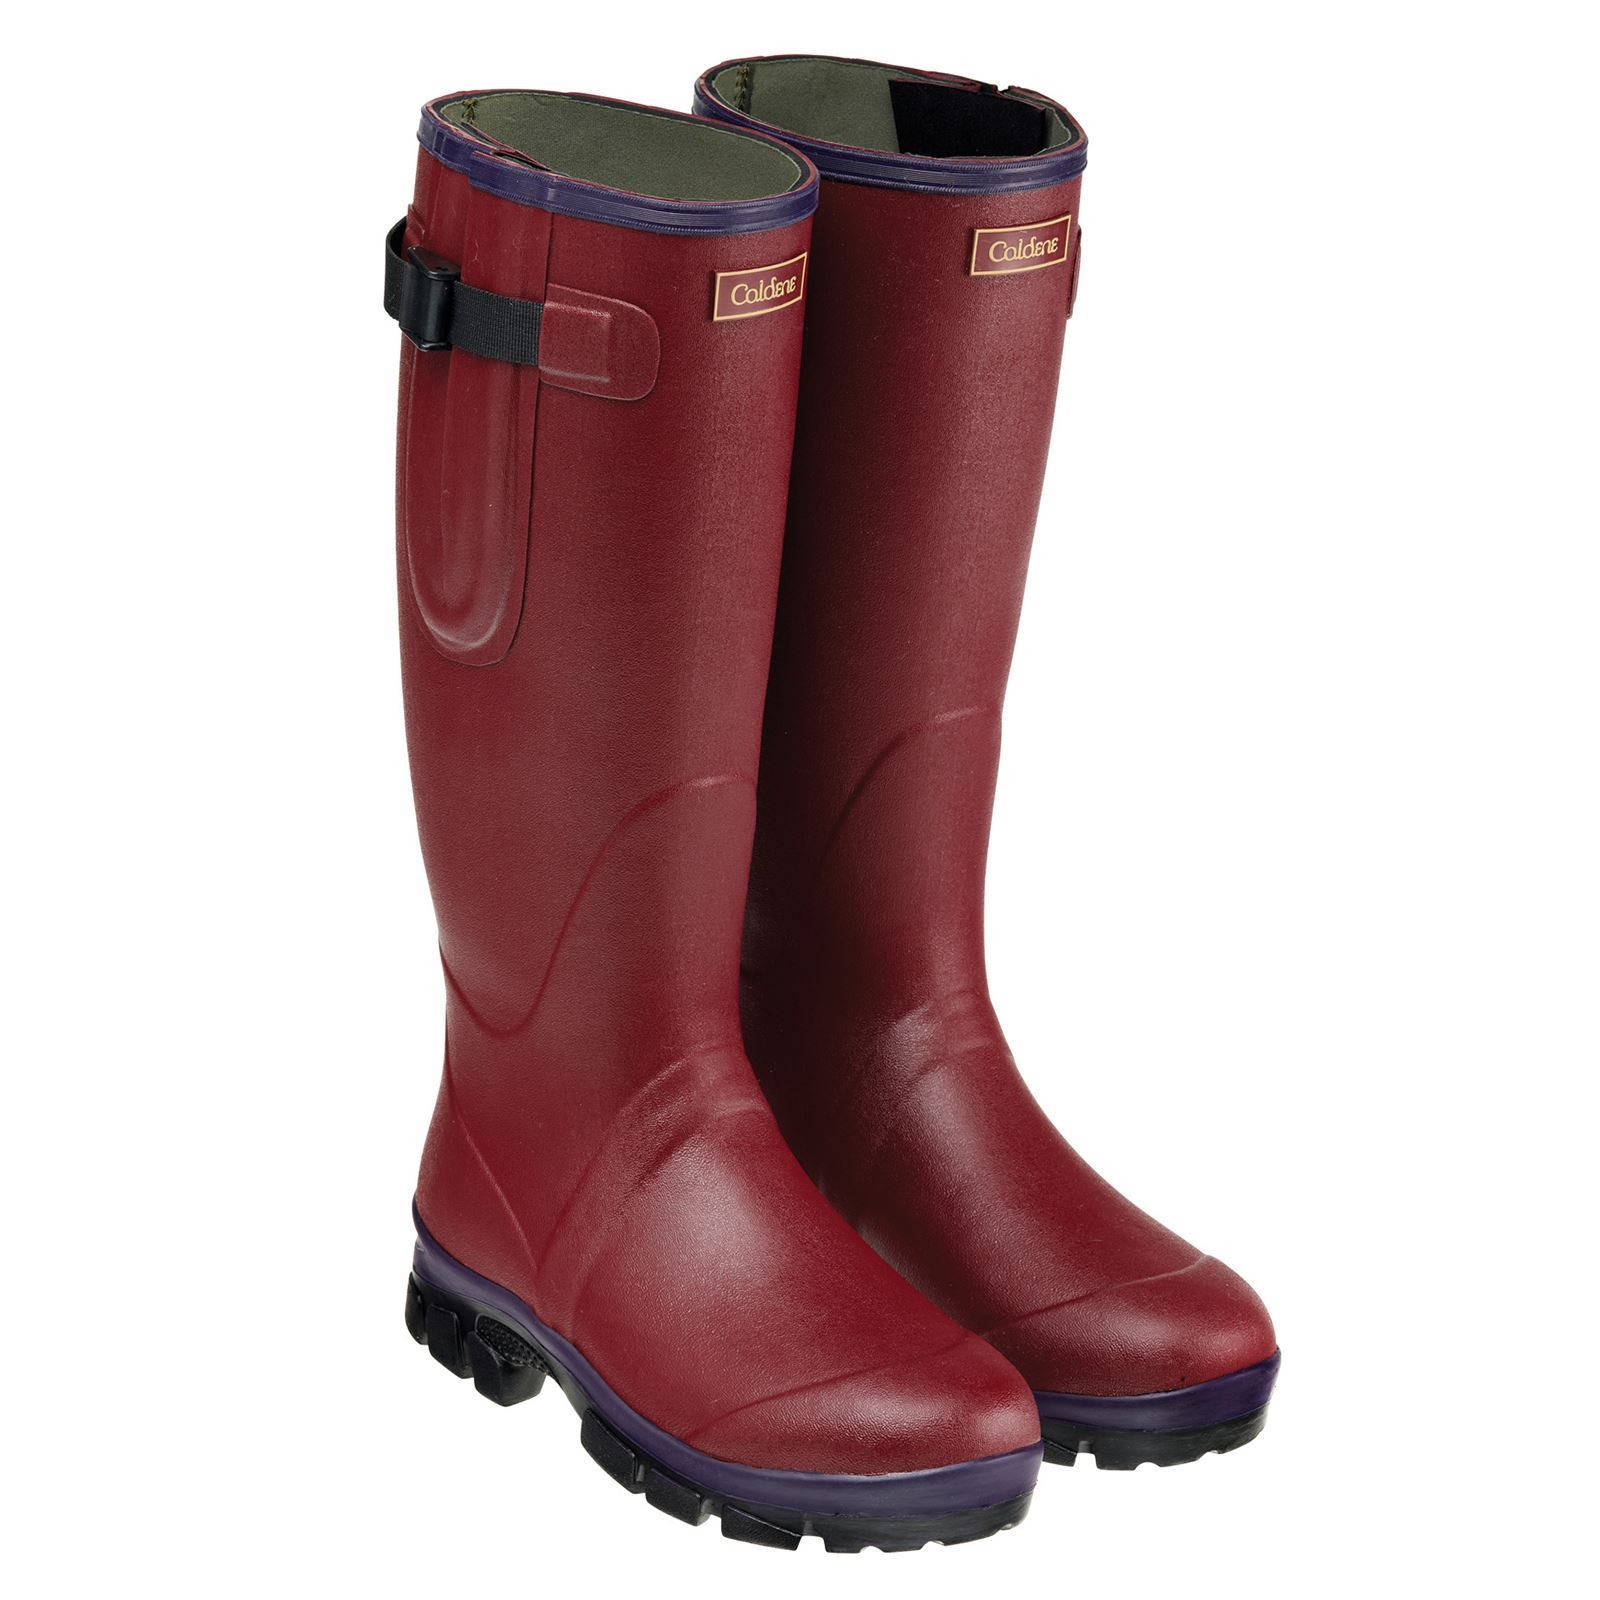 Caldene-Ecuestre-UNISEX-NEOPRENO-Westfield-Botas-agua-confort-y-CALIDEZ